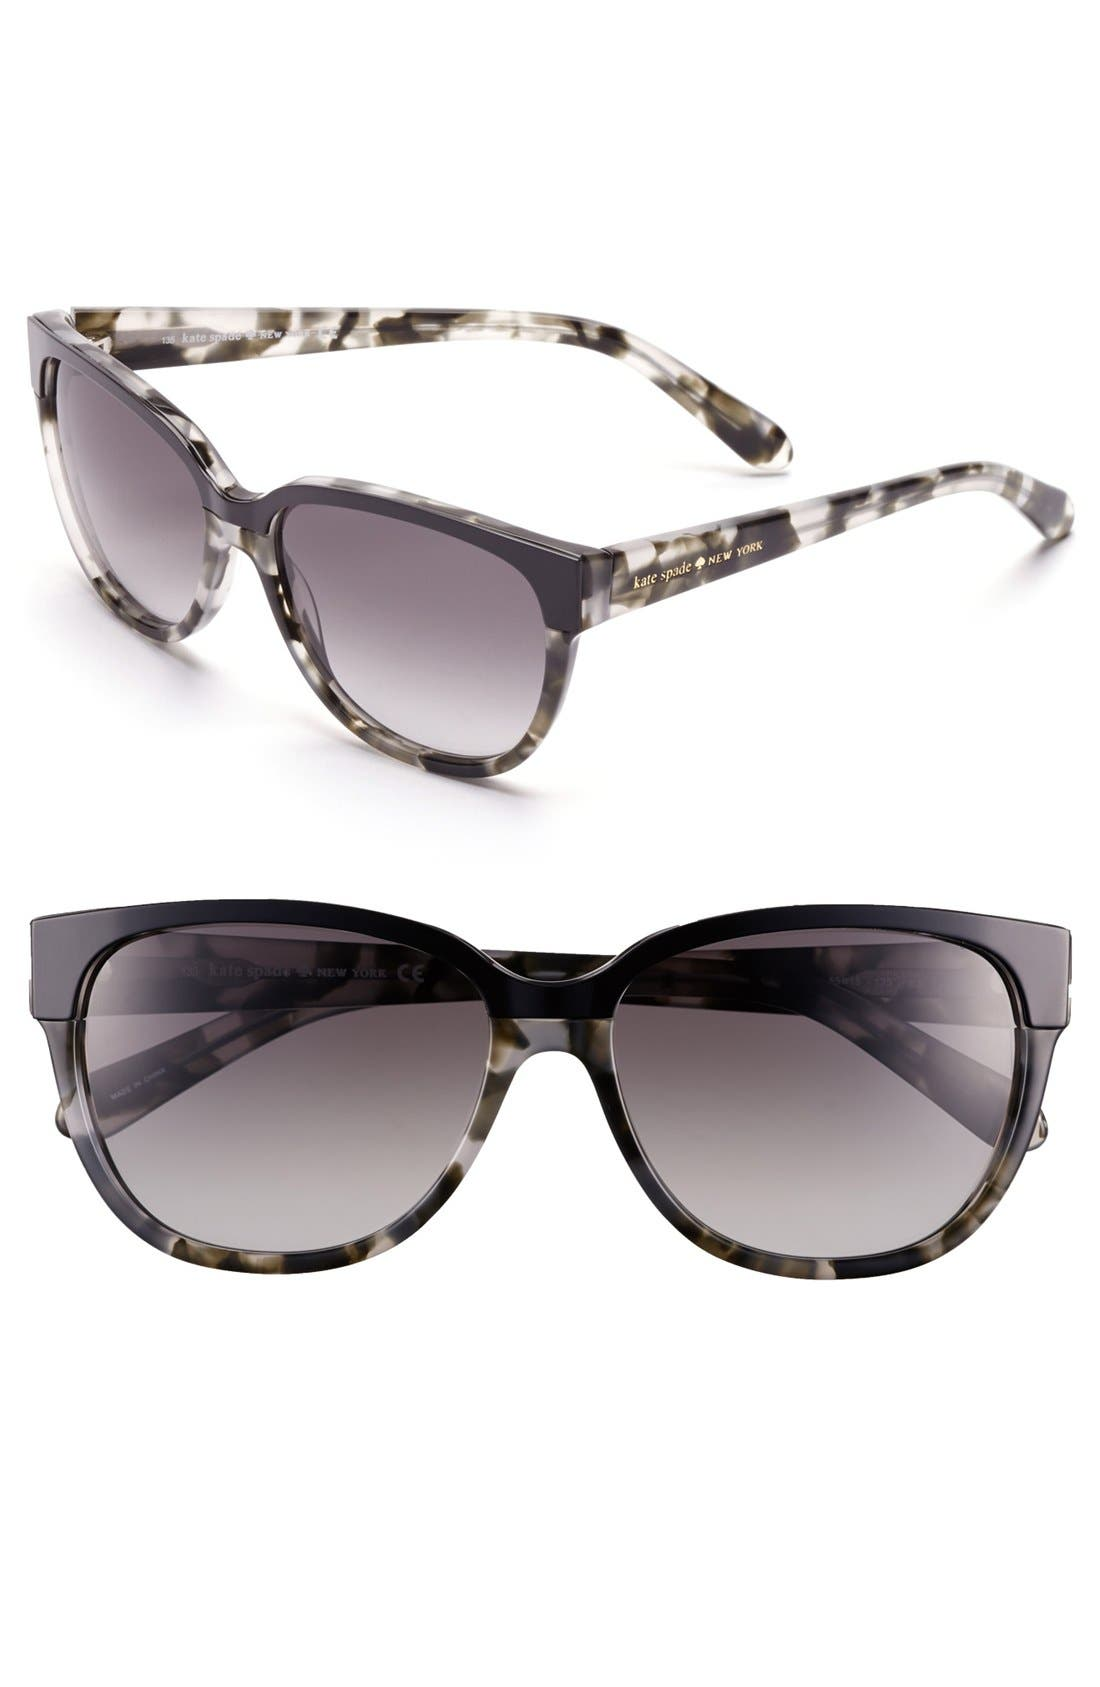 Main Image - kate spade new york 55mm retro sunglasses